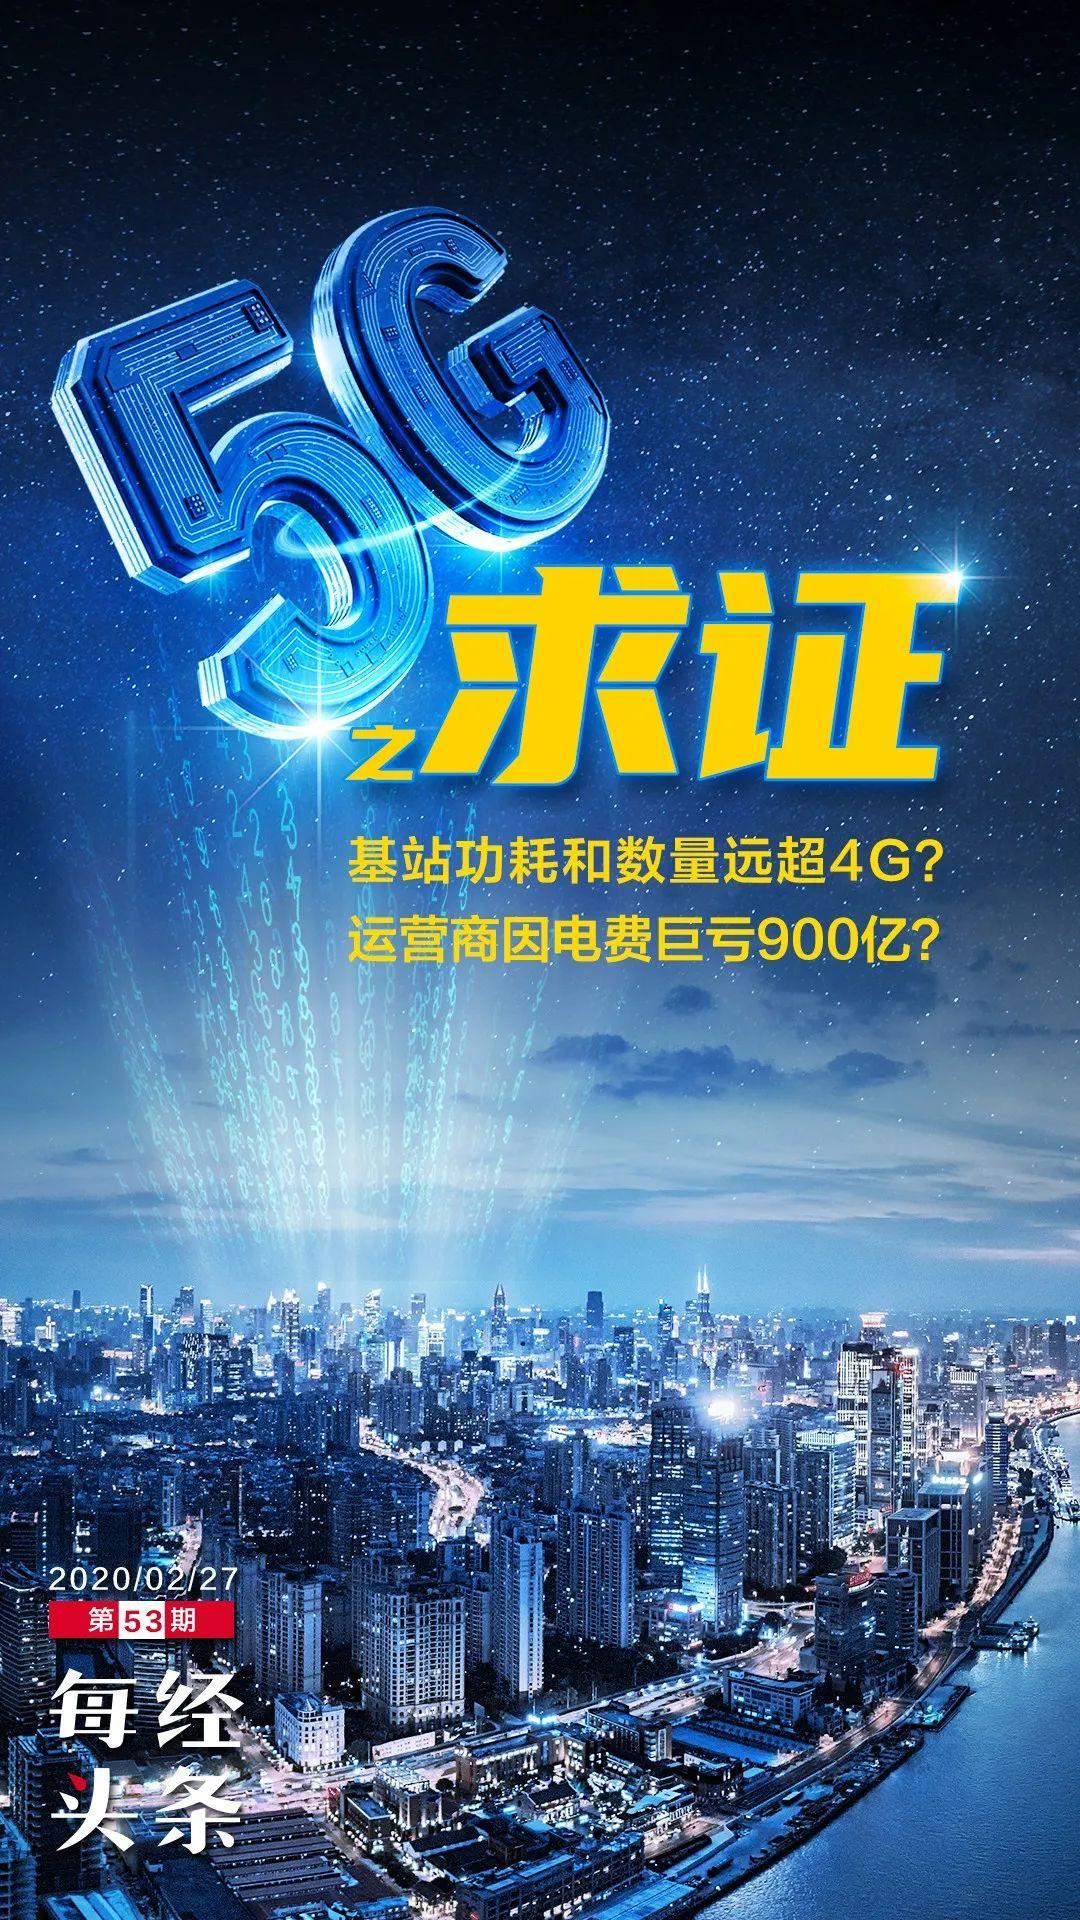 5G基站1年电费2400亿将致运营商巨亏907亿?测算结果来了……